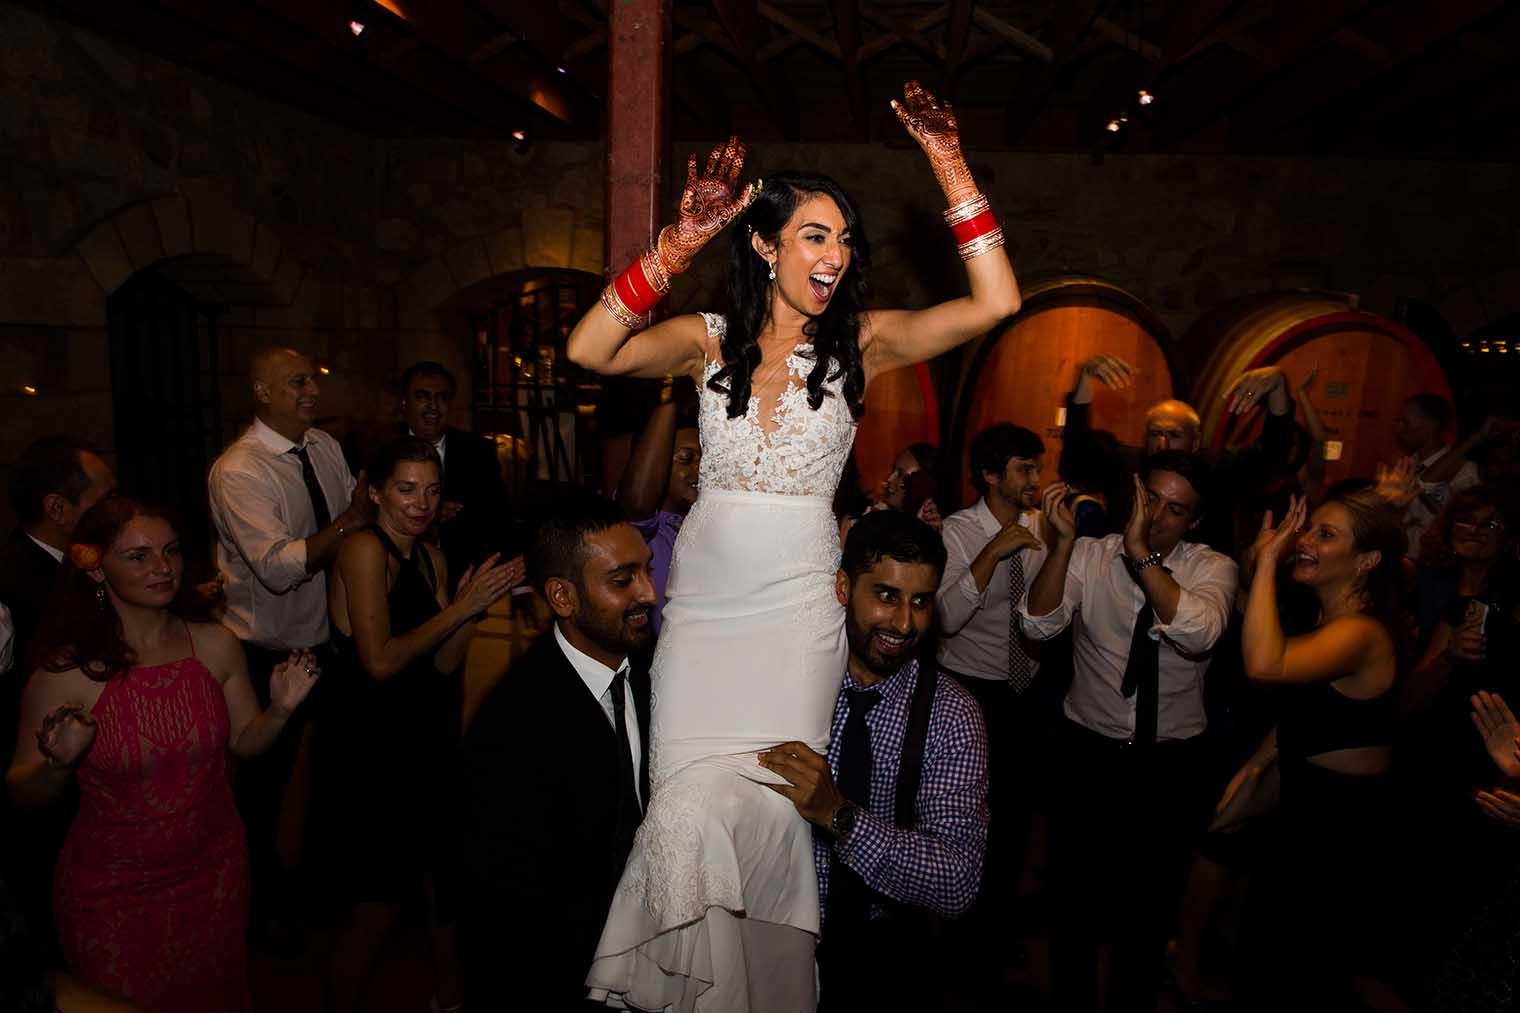 V. Sattui Winery Wedding Dancing Photos